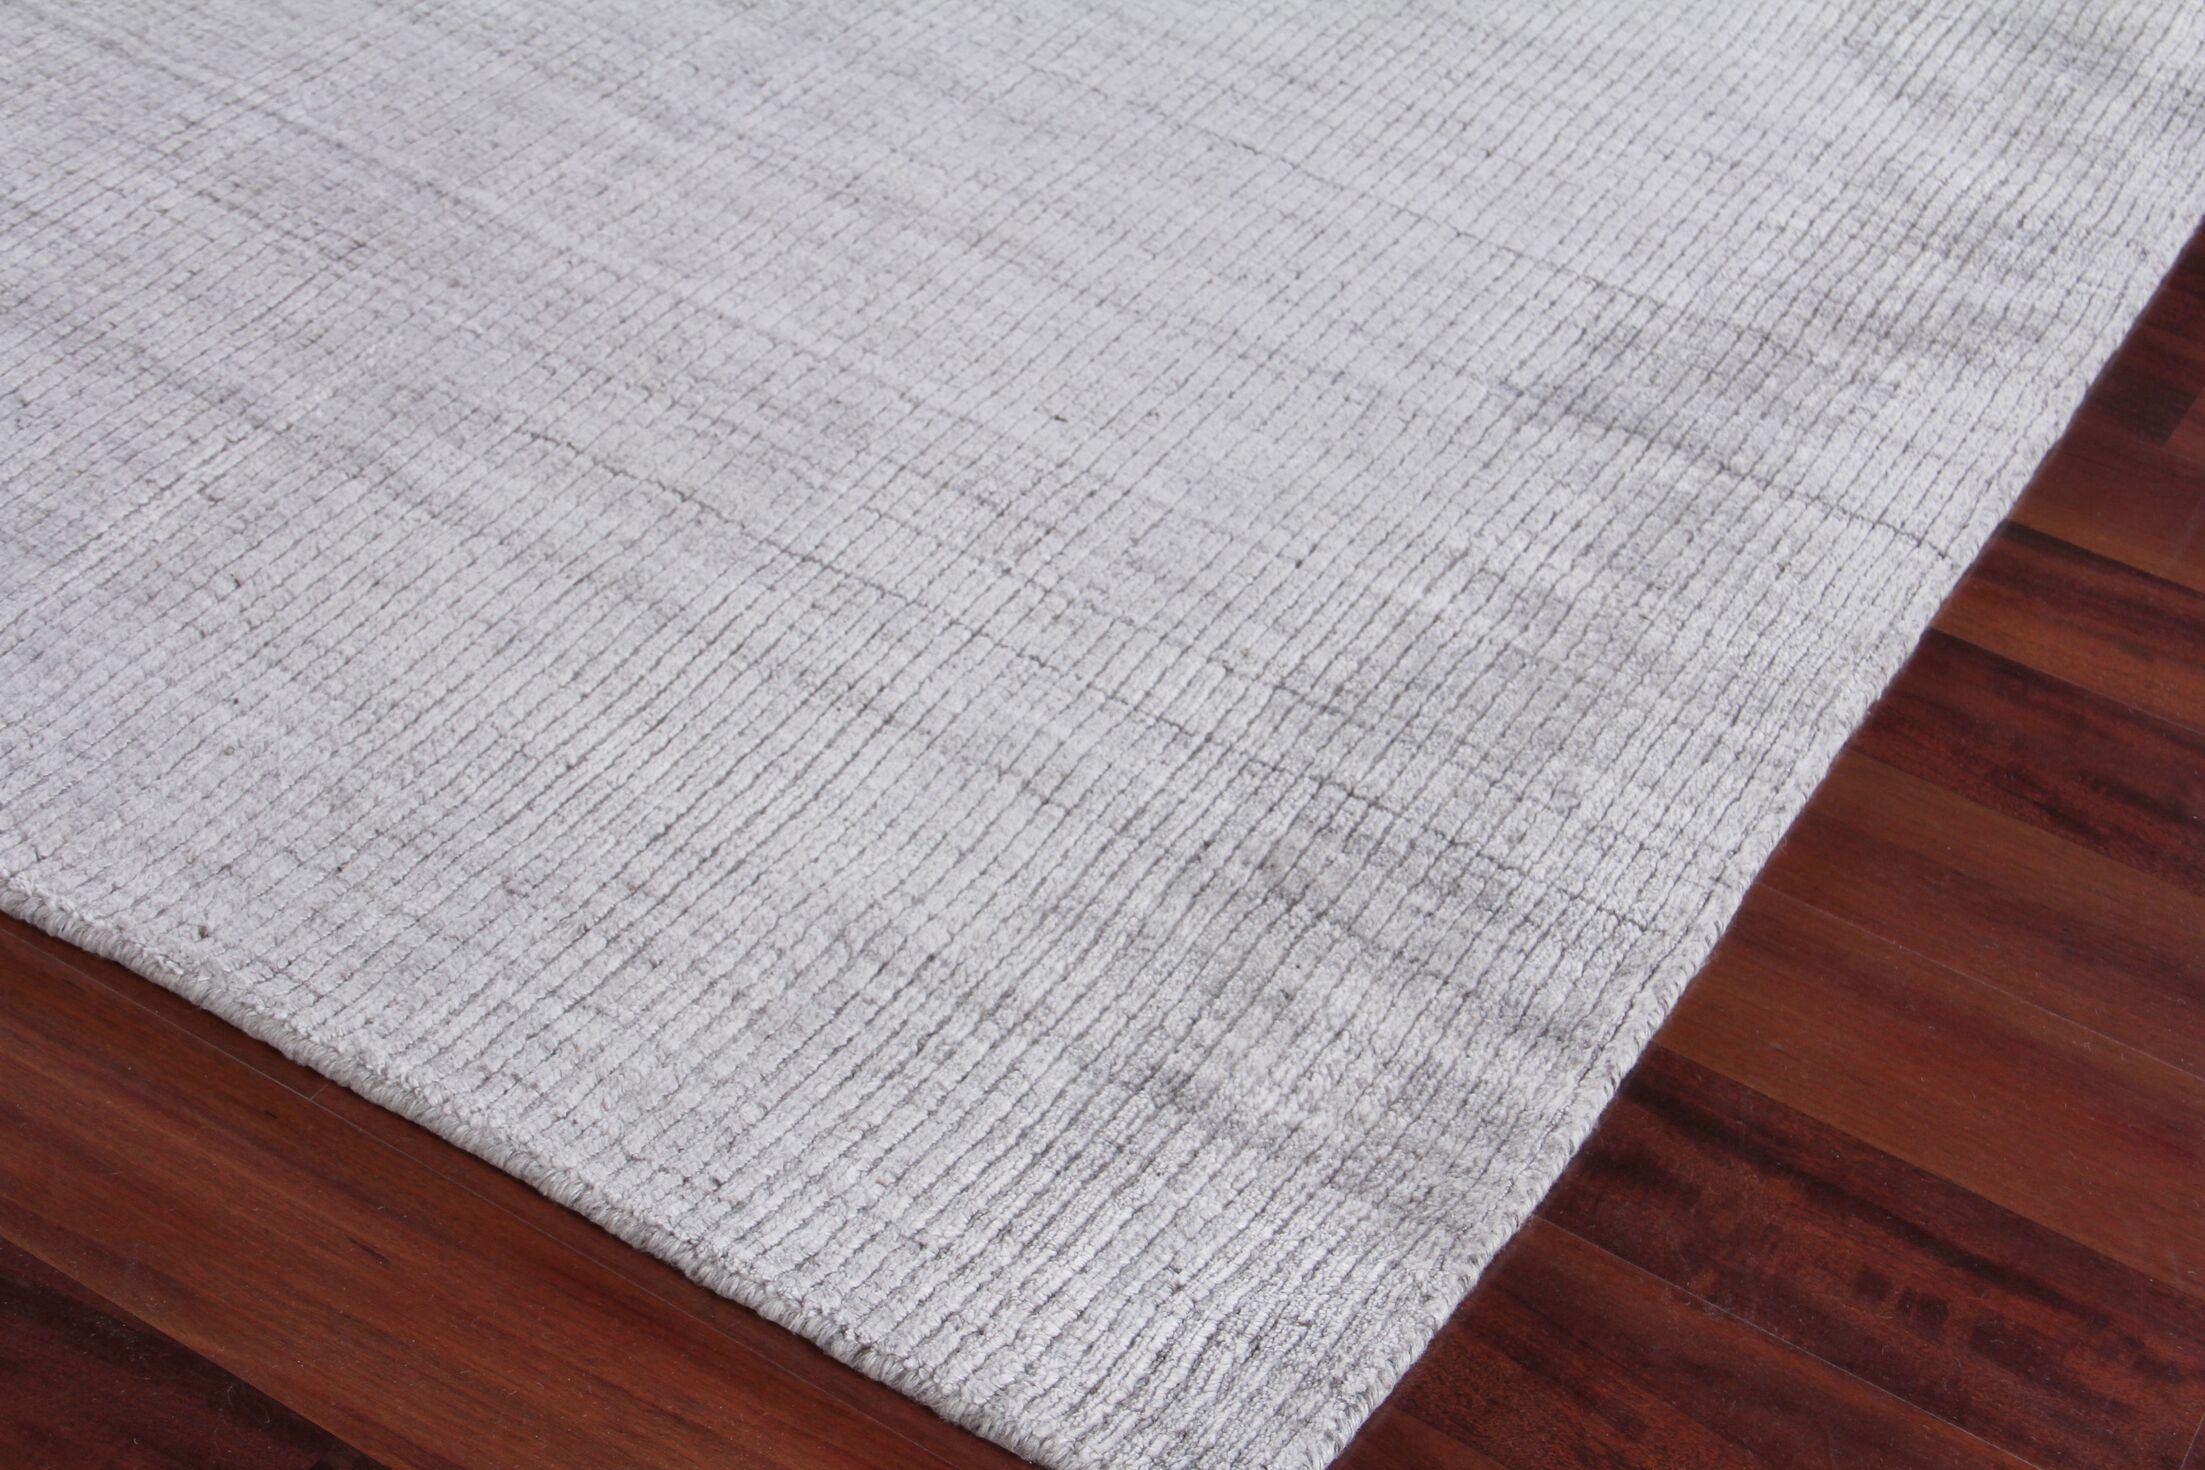 Robin Hand-Woven Silver Area Rug Rug Size: Rectangle 12' x 15'